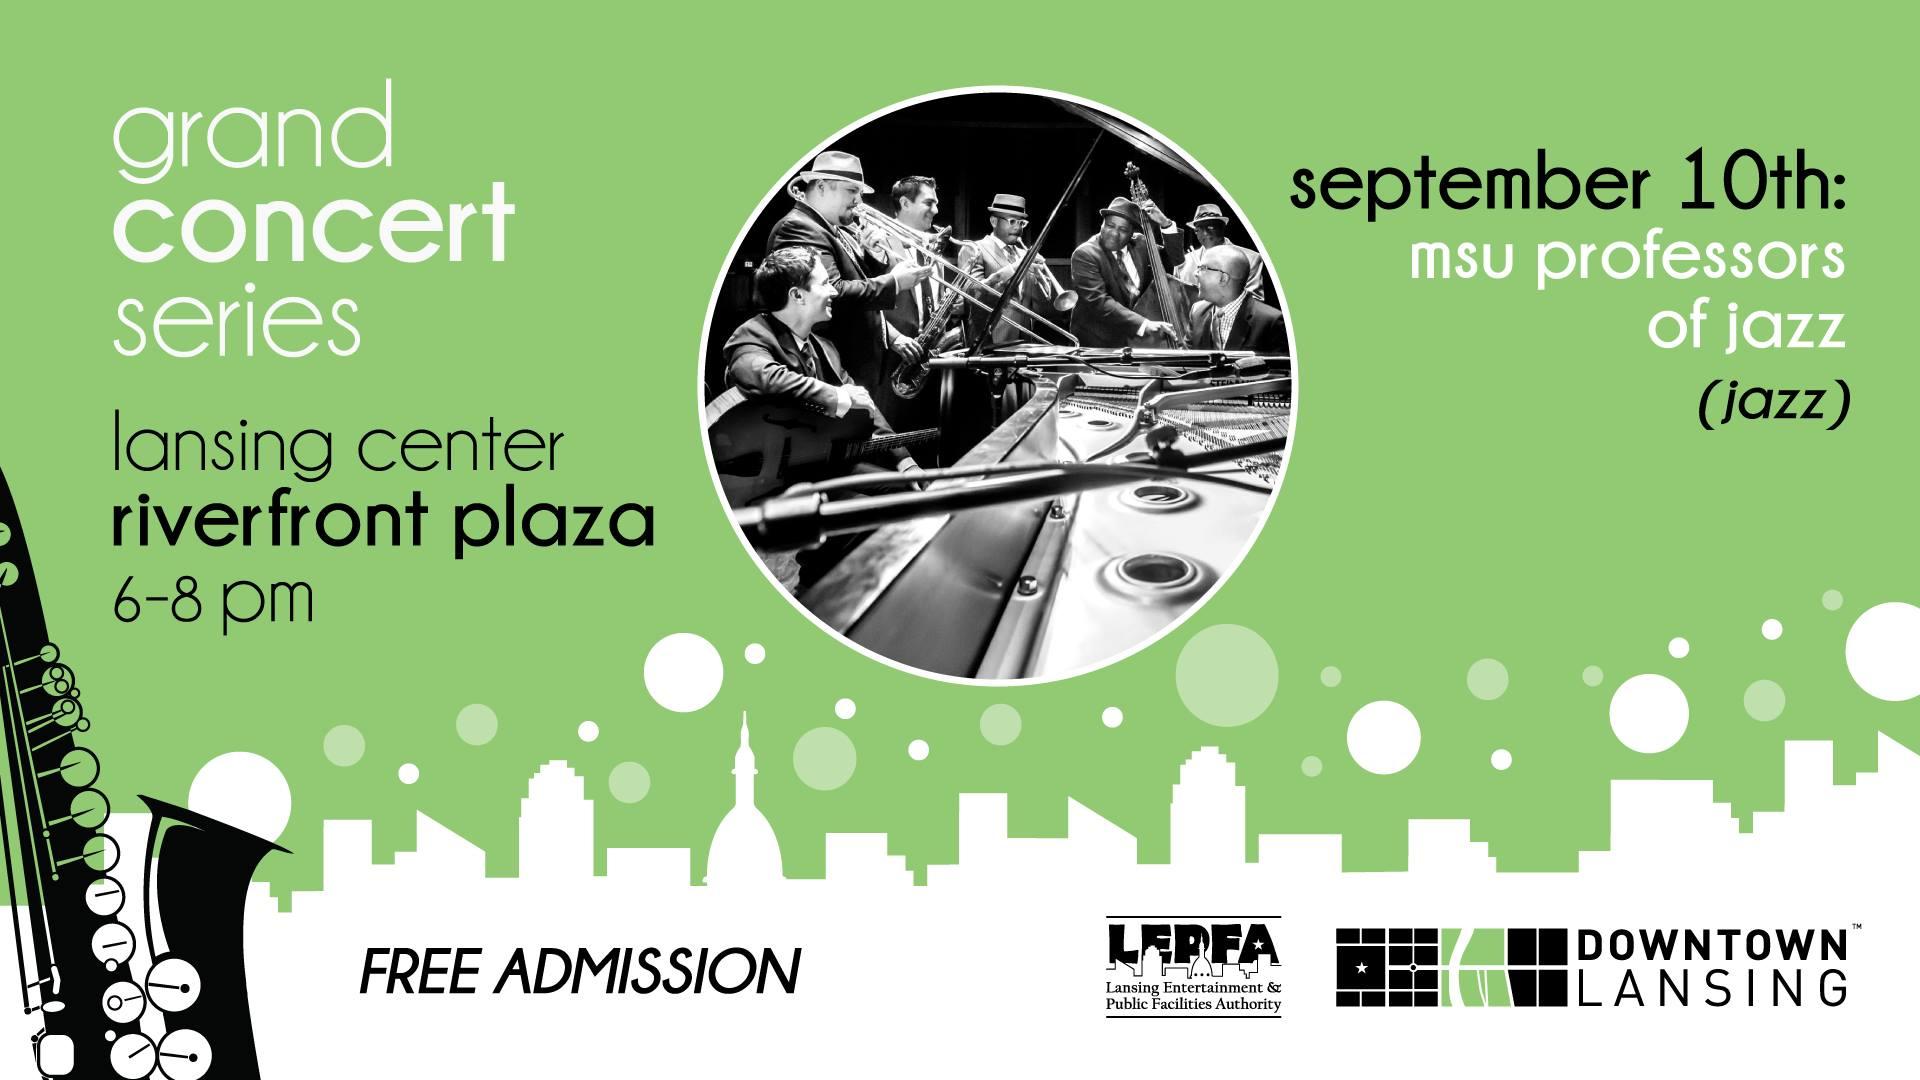 Poster graphic: Grand Concert Sereis, Lansing riverfront plaza, 6–8pm, September 10th